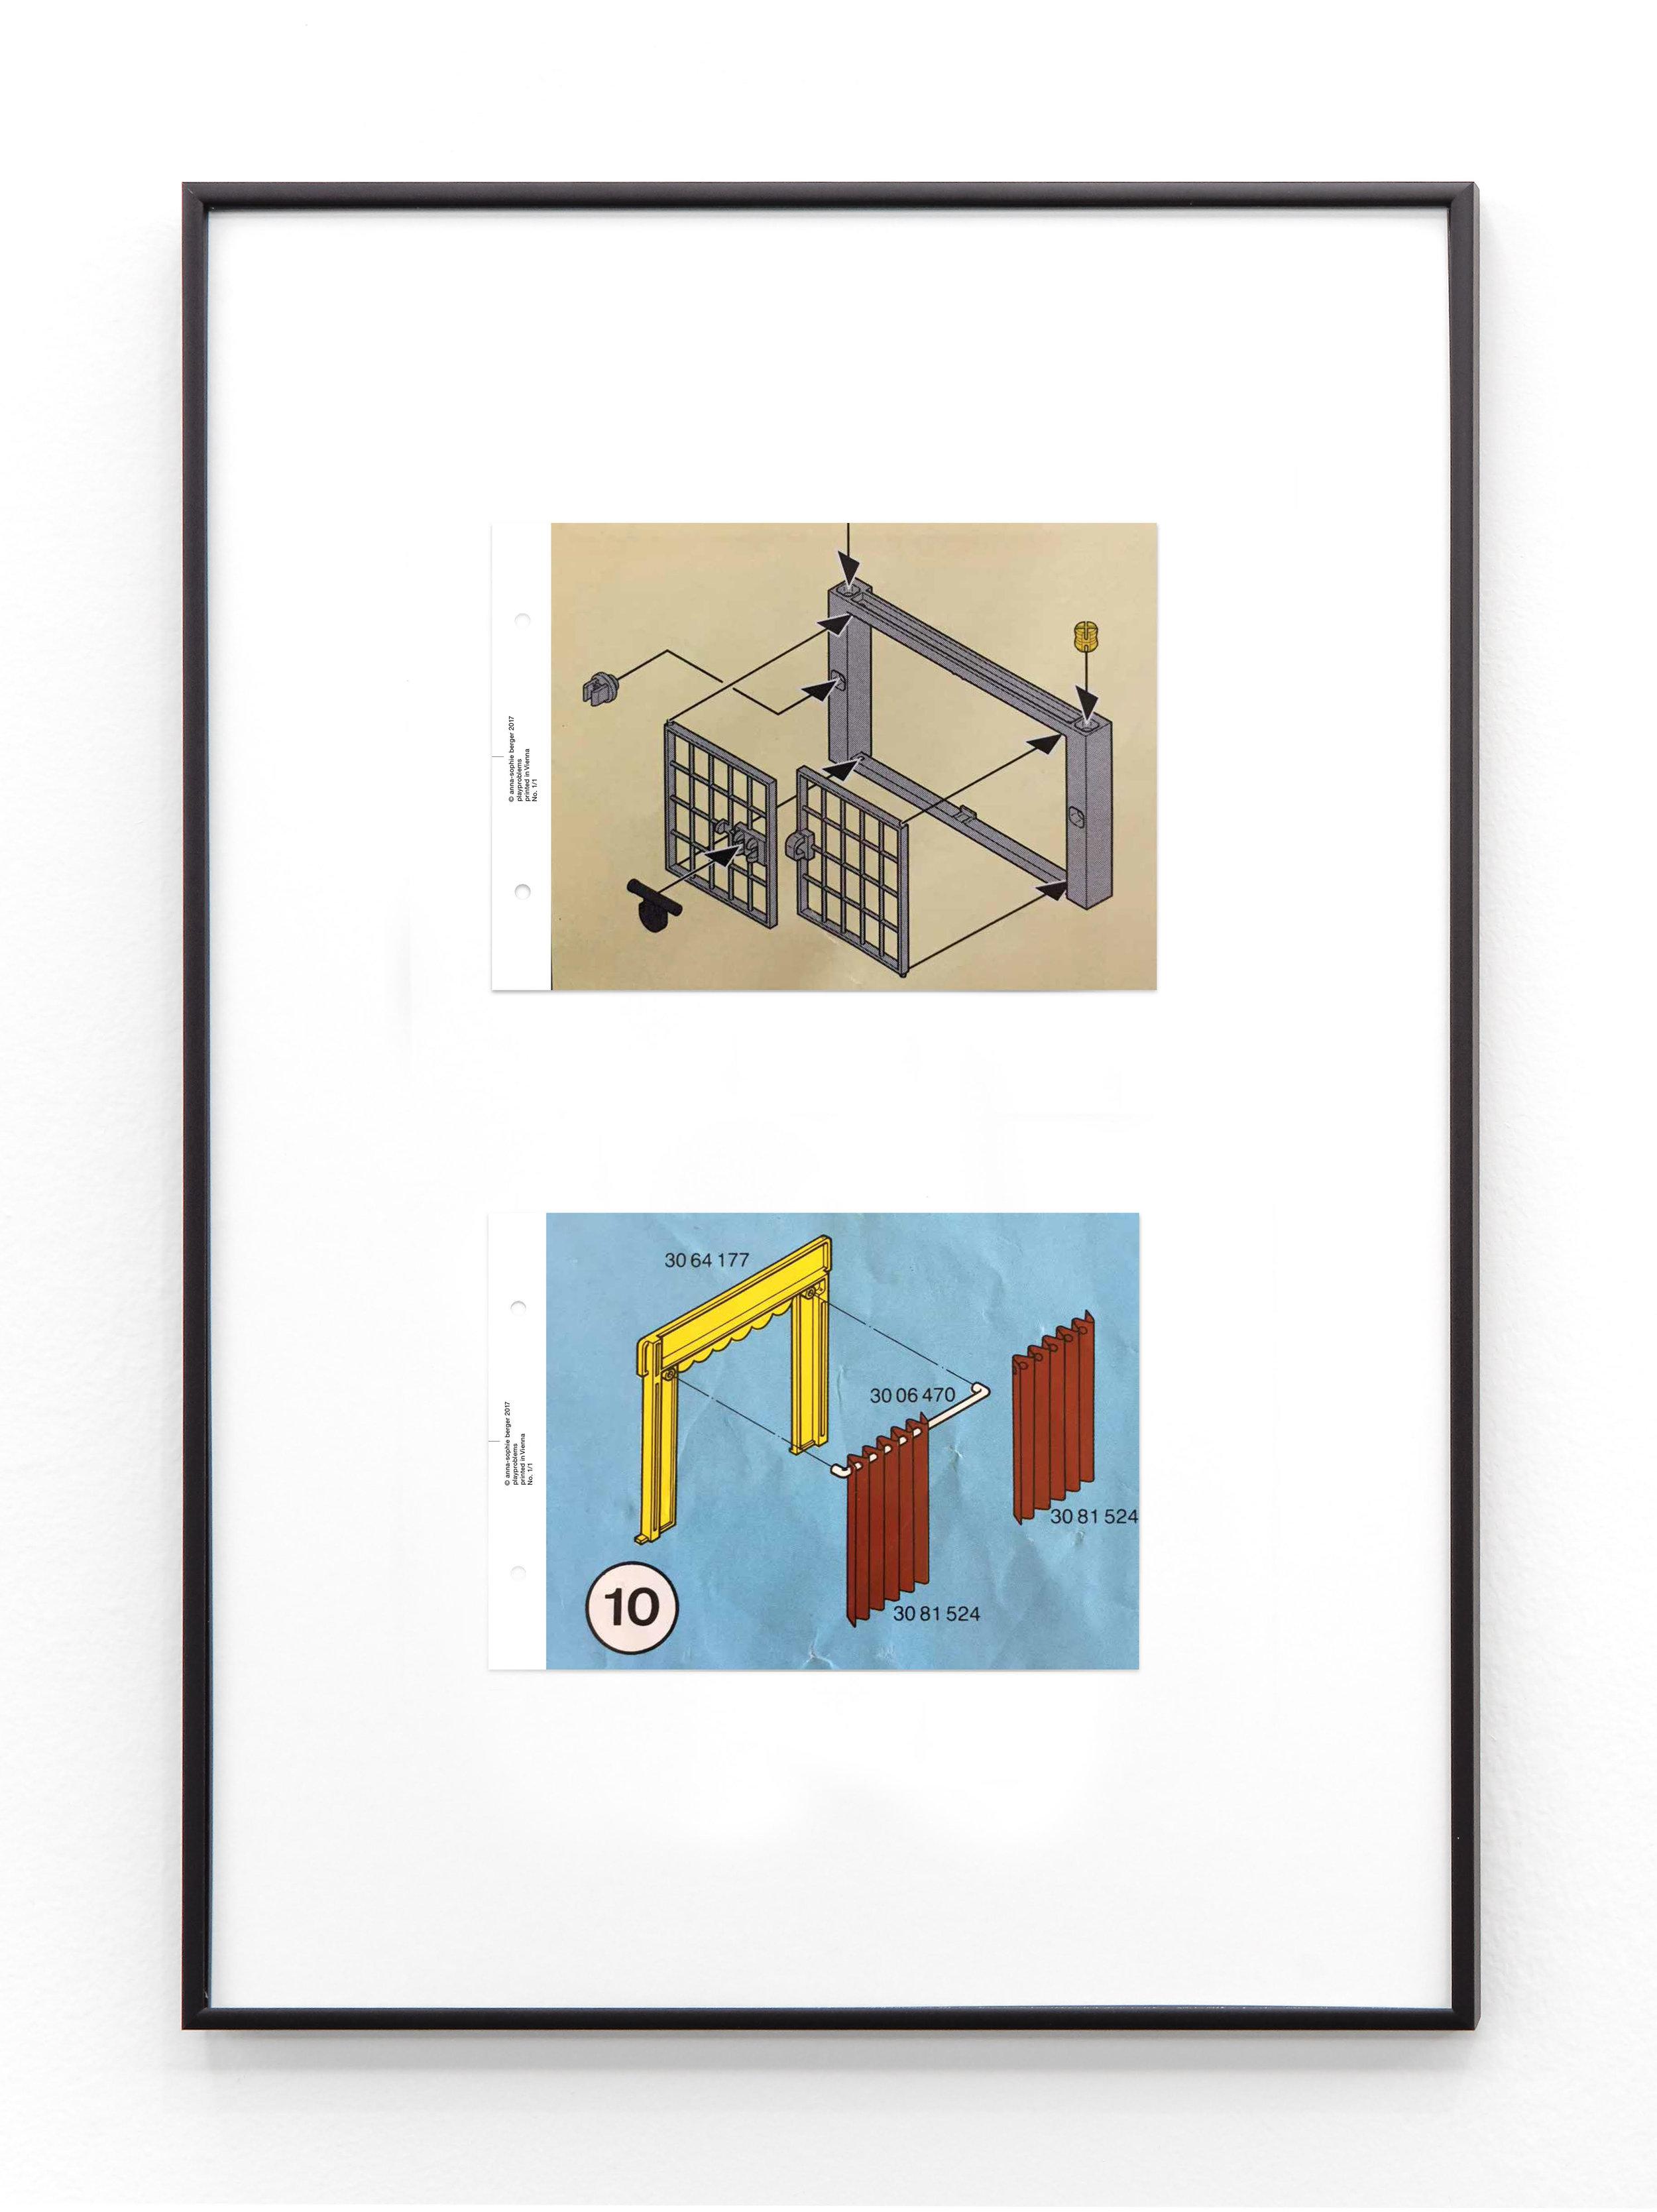 Anna-Sophie Berger,  Playproblems 2 , 2018 Laserprint on paper 60 x 40 cm